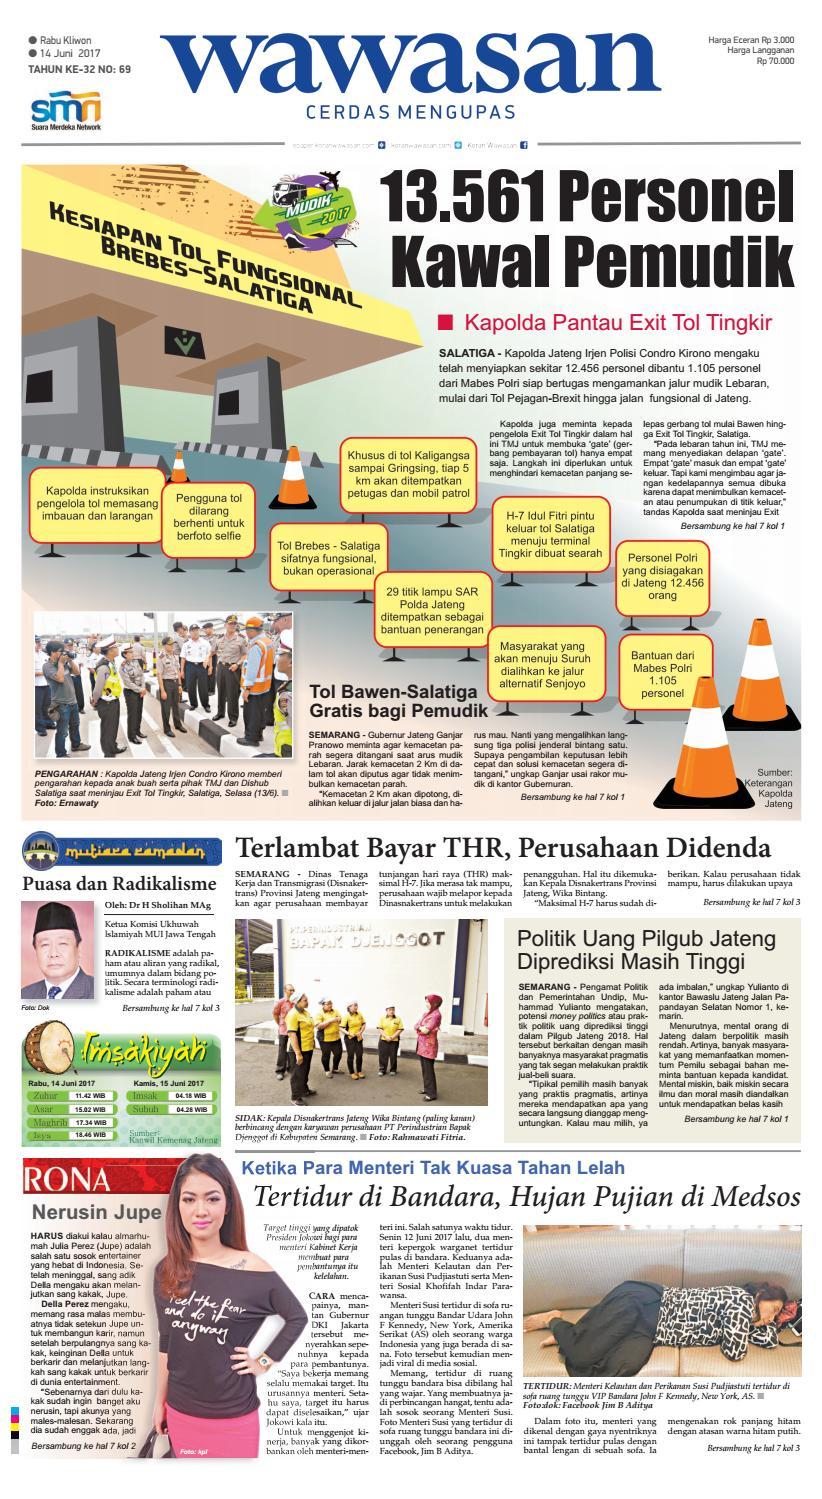 Wawasan 14 Juni 2017 By Koran Pagi Issuu Produk Ukm Bumn Batik Tulis Babon Angrem